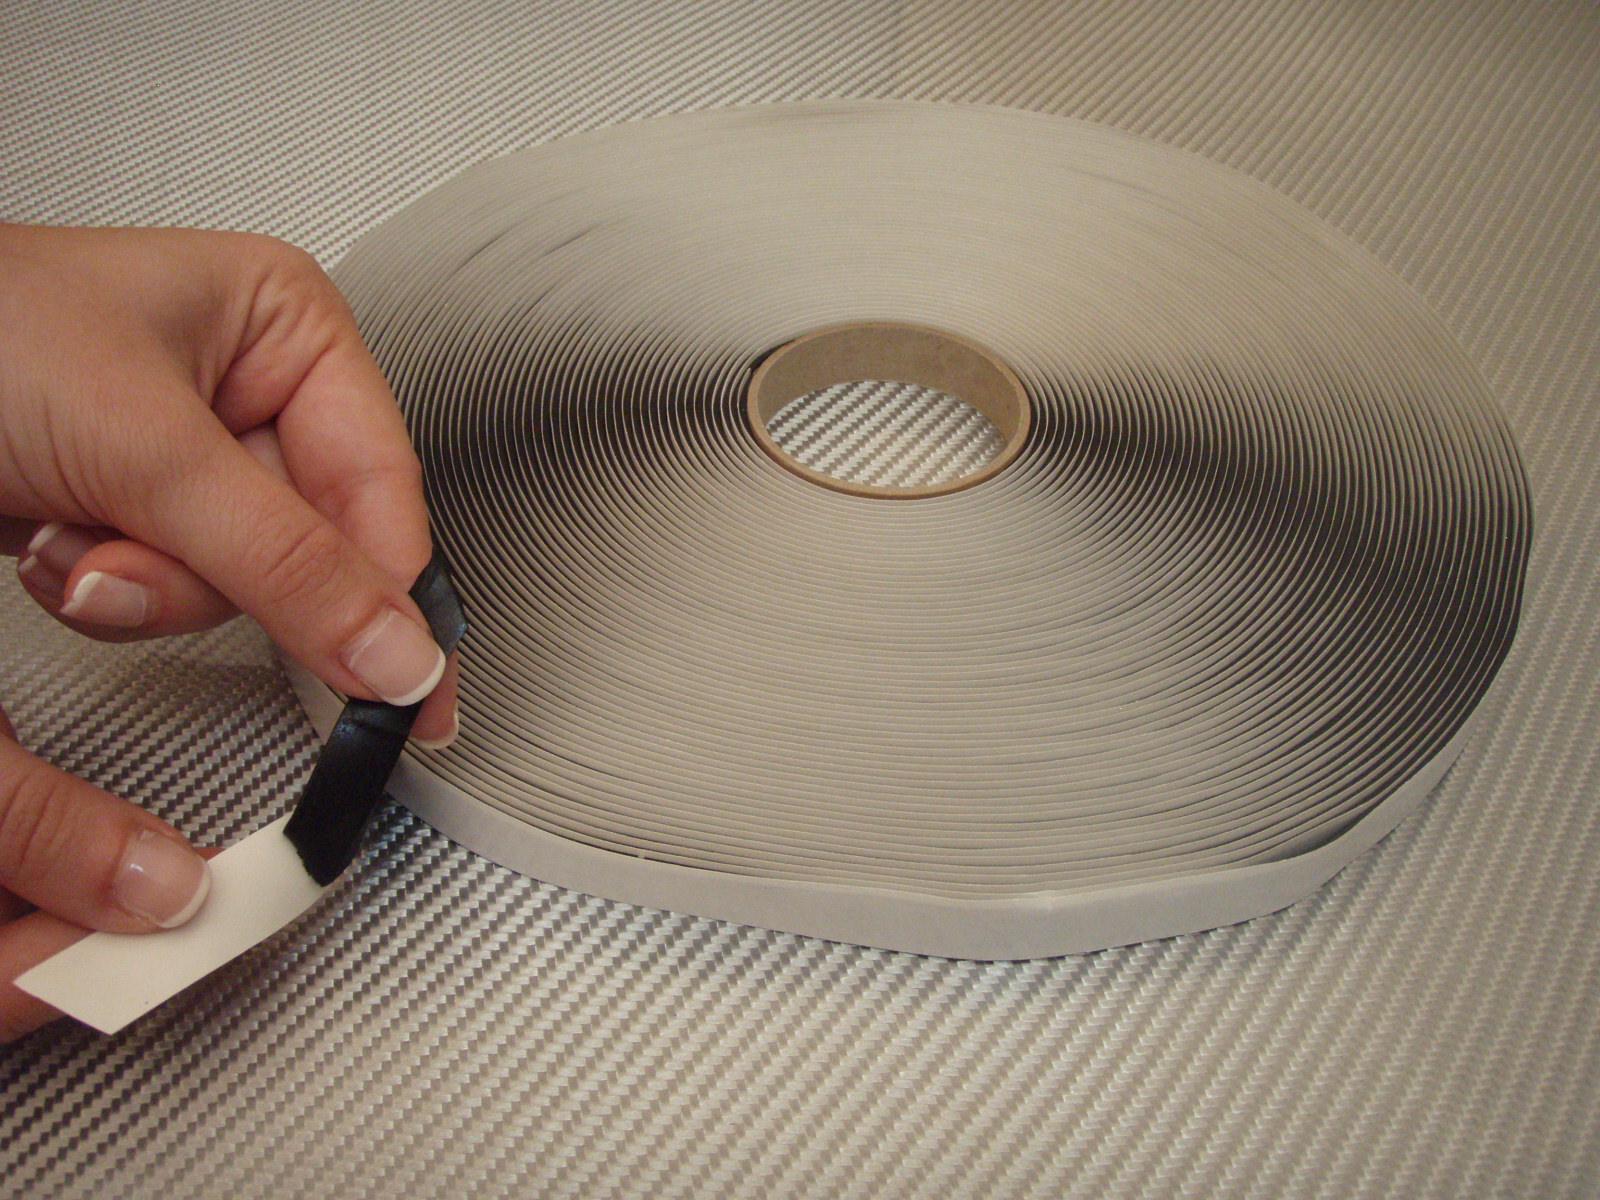 Mastic sealant tape <br> VC099